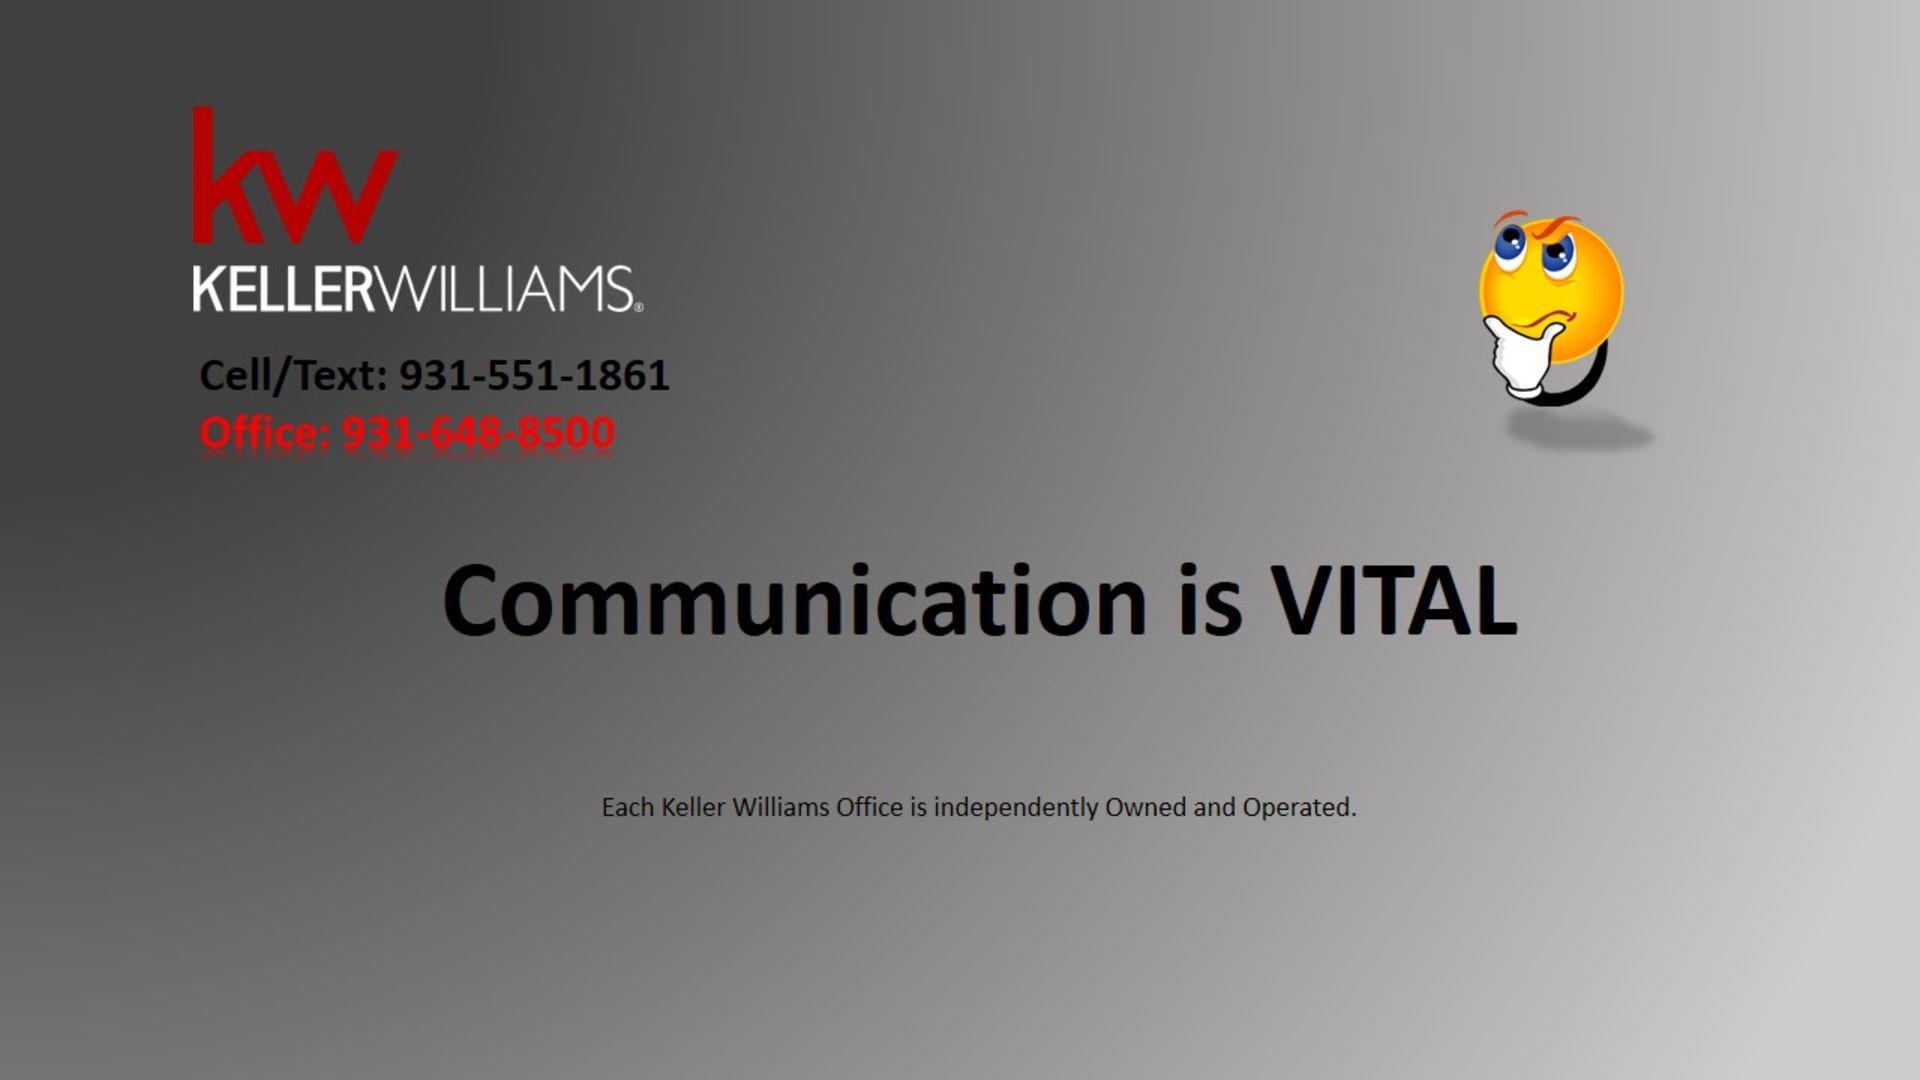 Communication is Vital